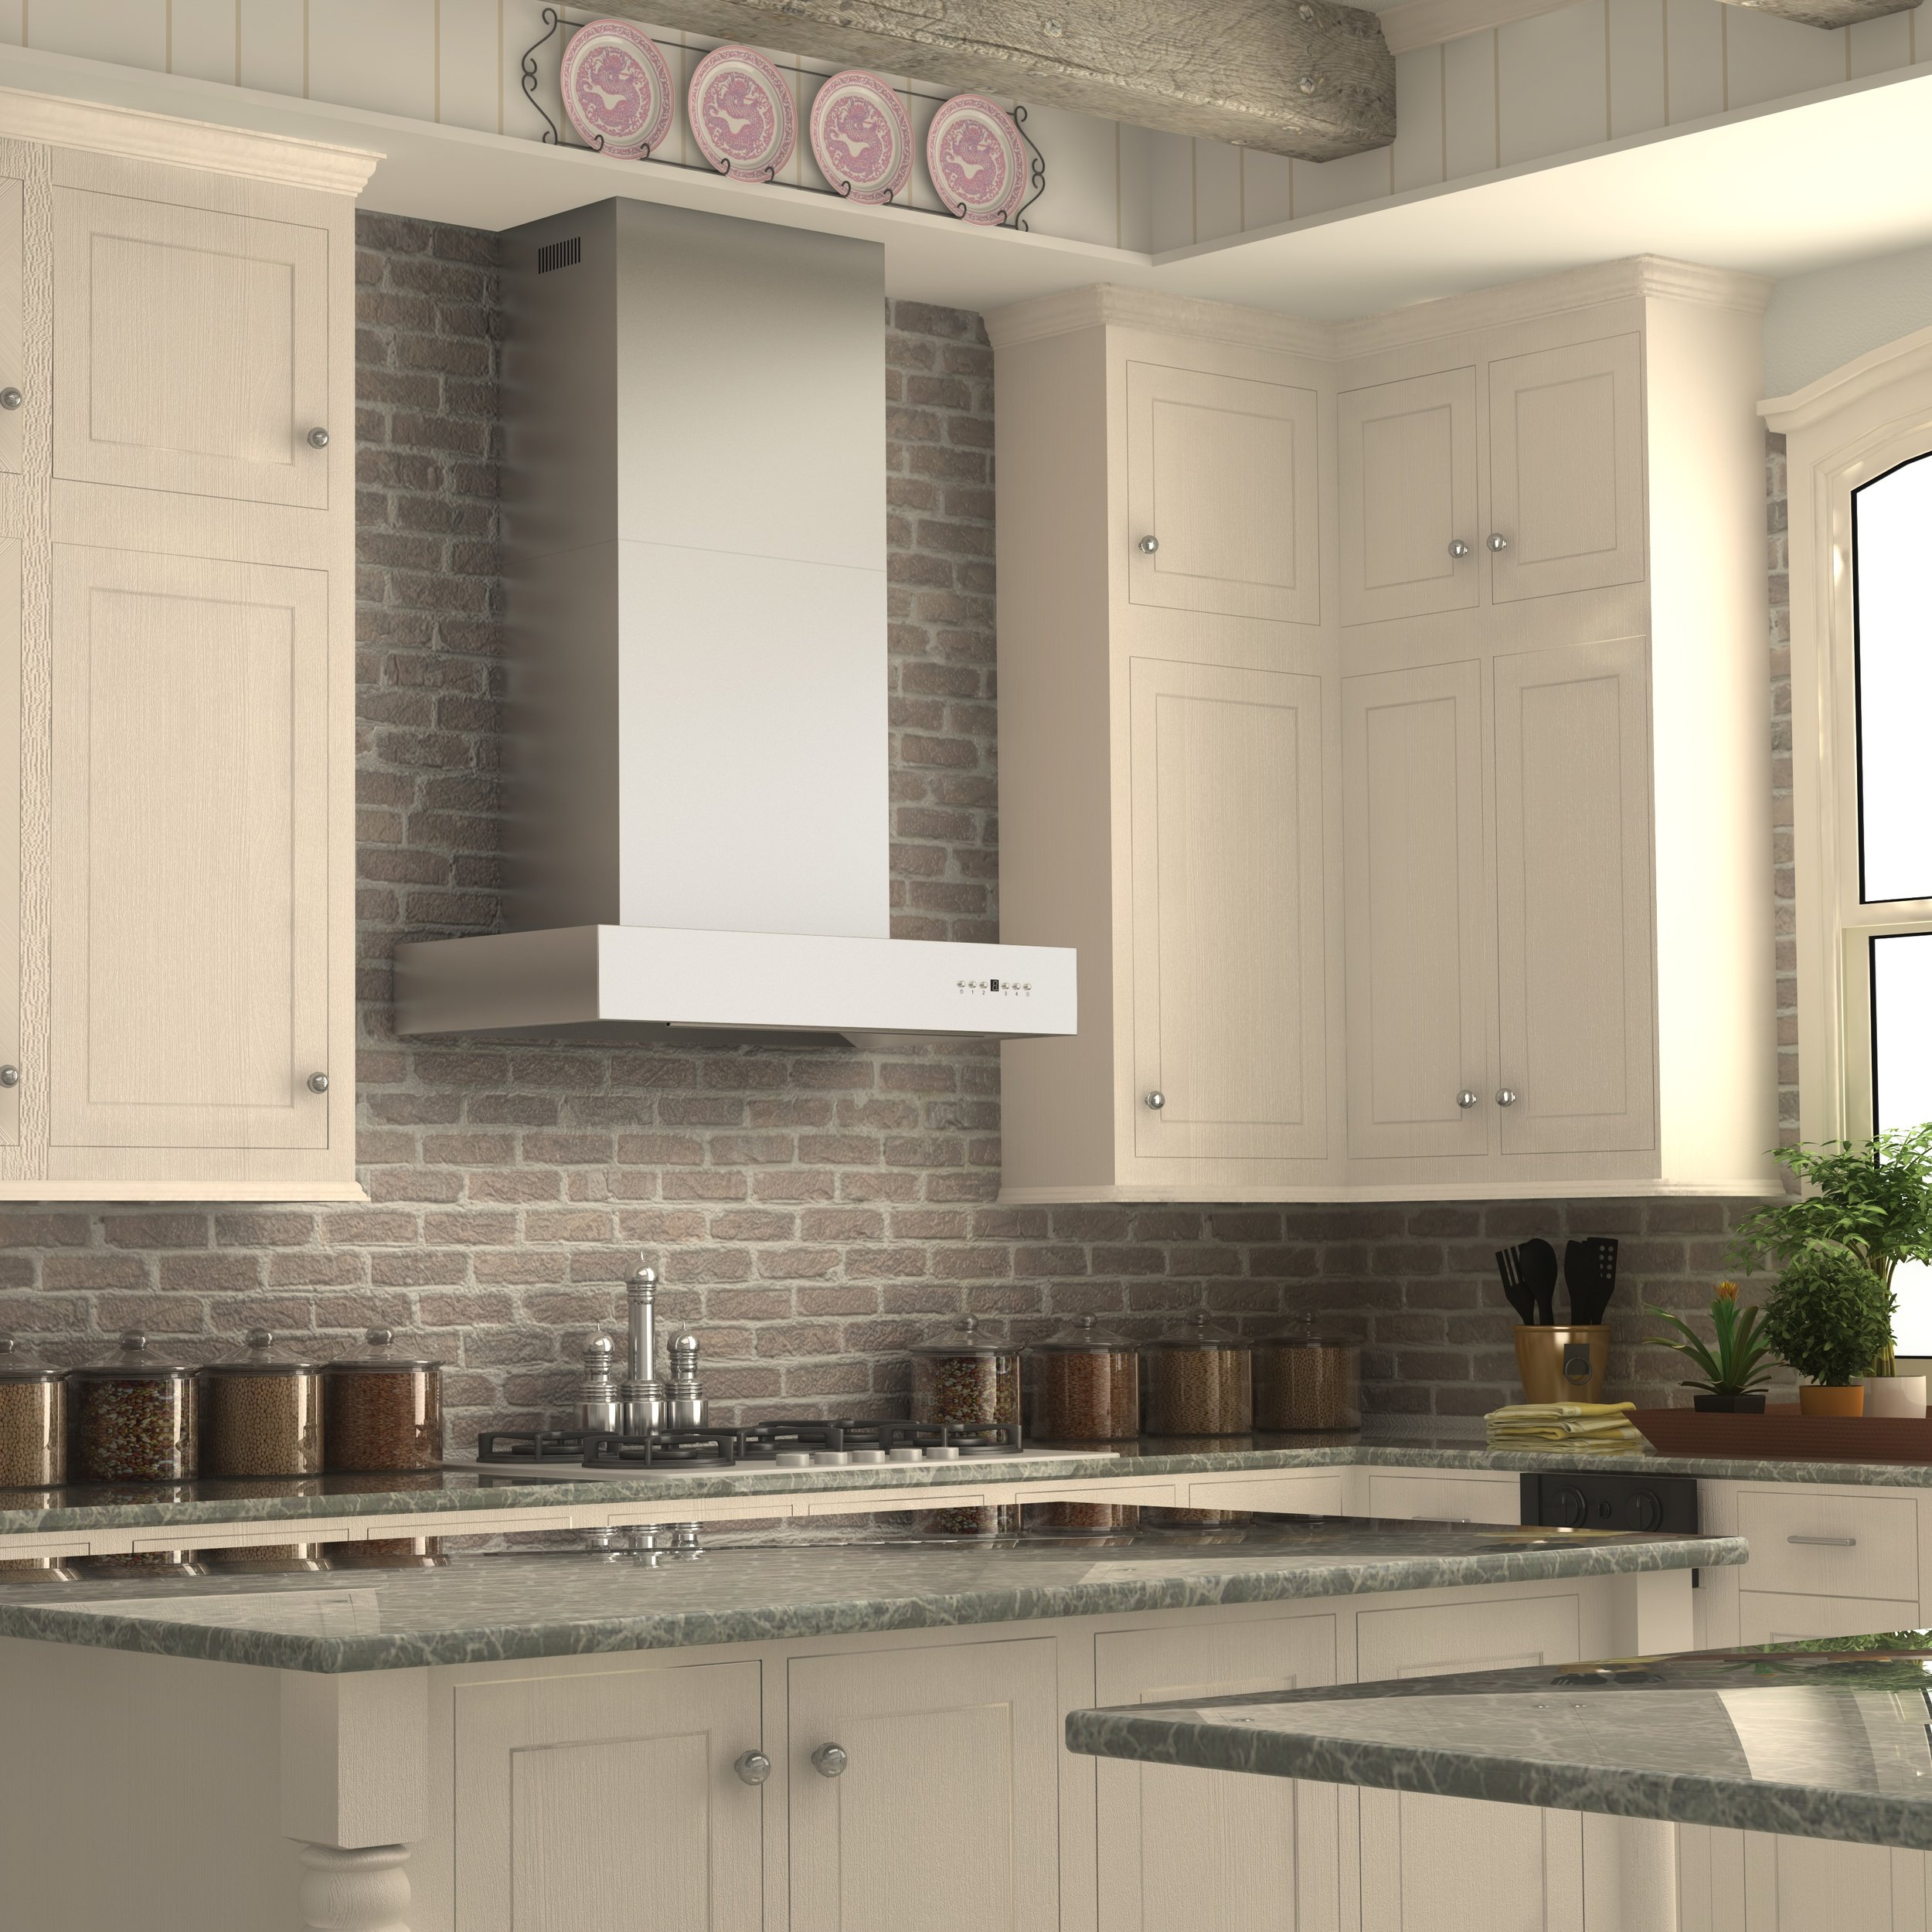 zline-stainless-steel-wall-mounted-range-hood-KECOM-kitchen 1.jpeg